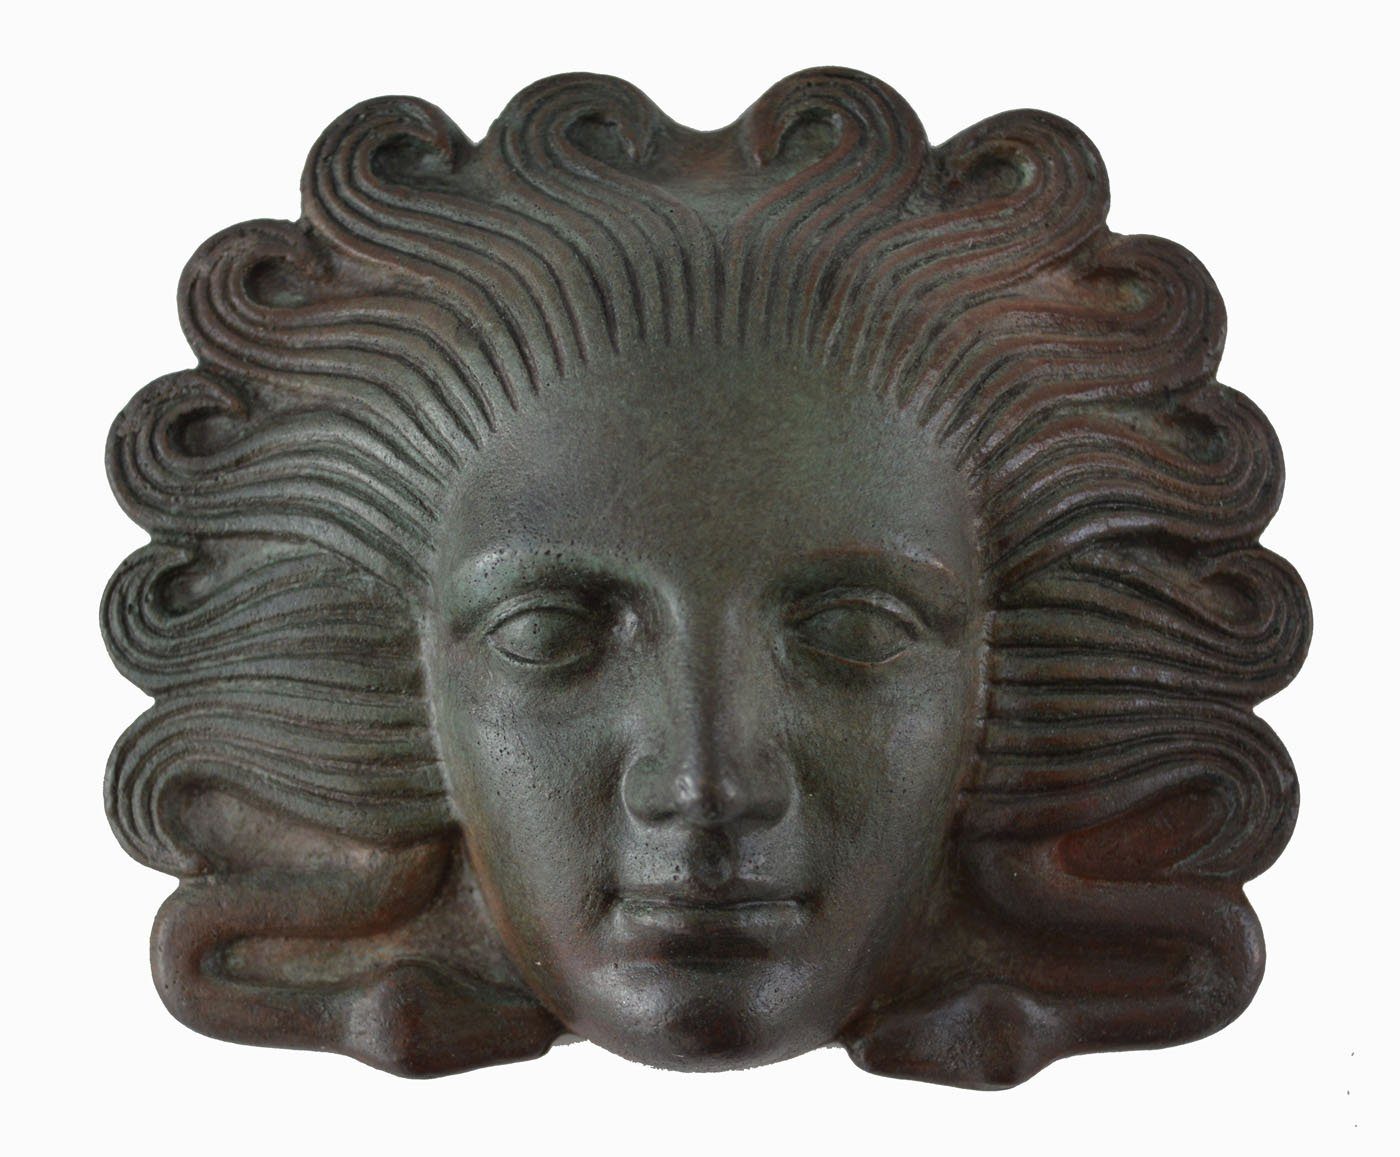 Estia Creations Medusa Miniature Mask with Bronze Color Effect - Ancient Greek Theatre - Gorgon Medousa by Estia Creations